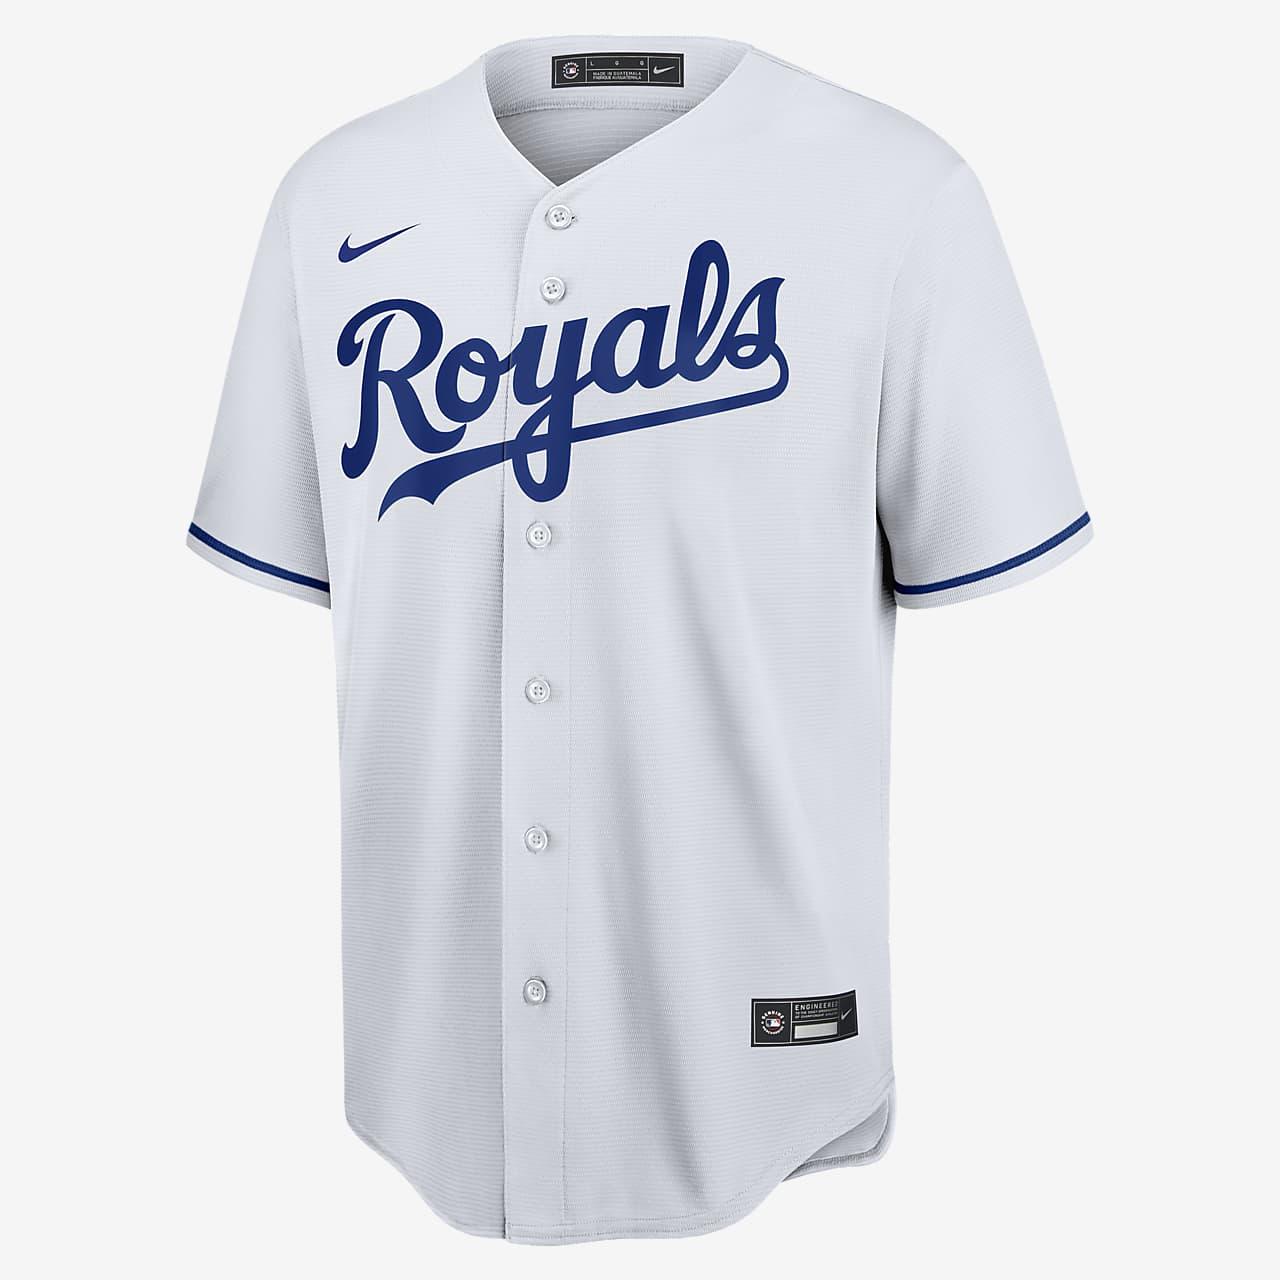 MLB Kansas City Royals (Salvador Perez) Men's Replica Baseball Jersey